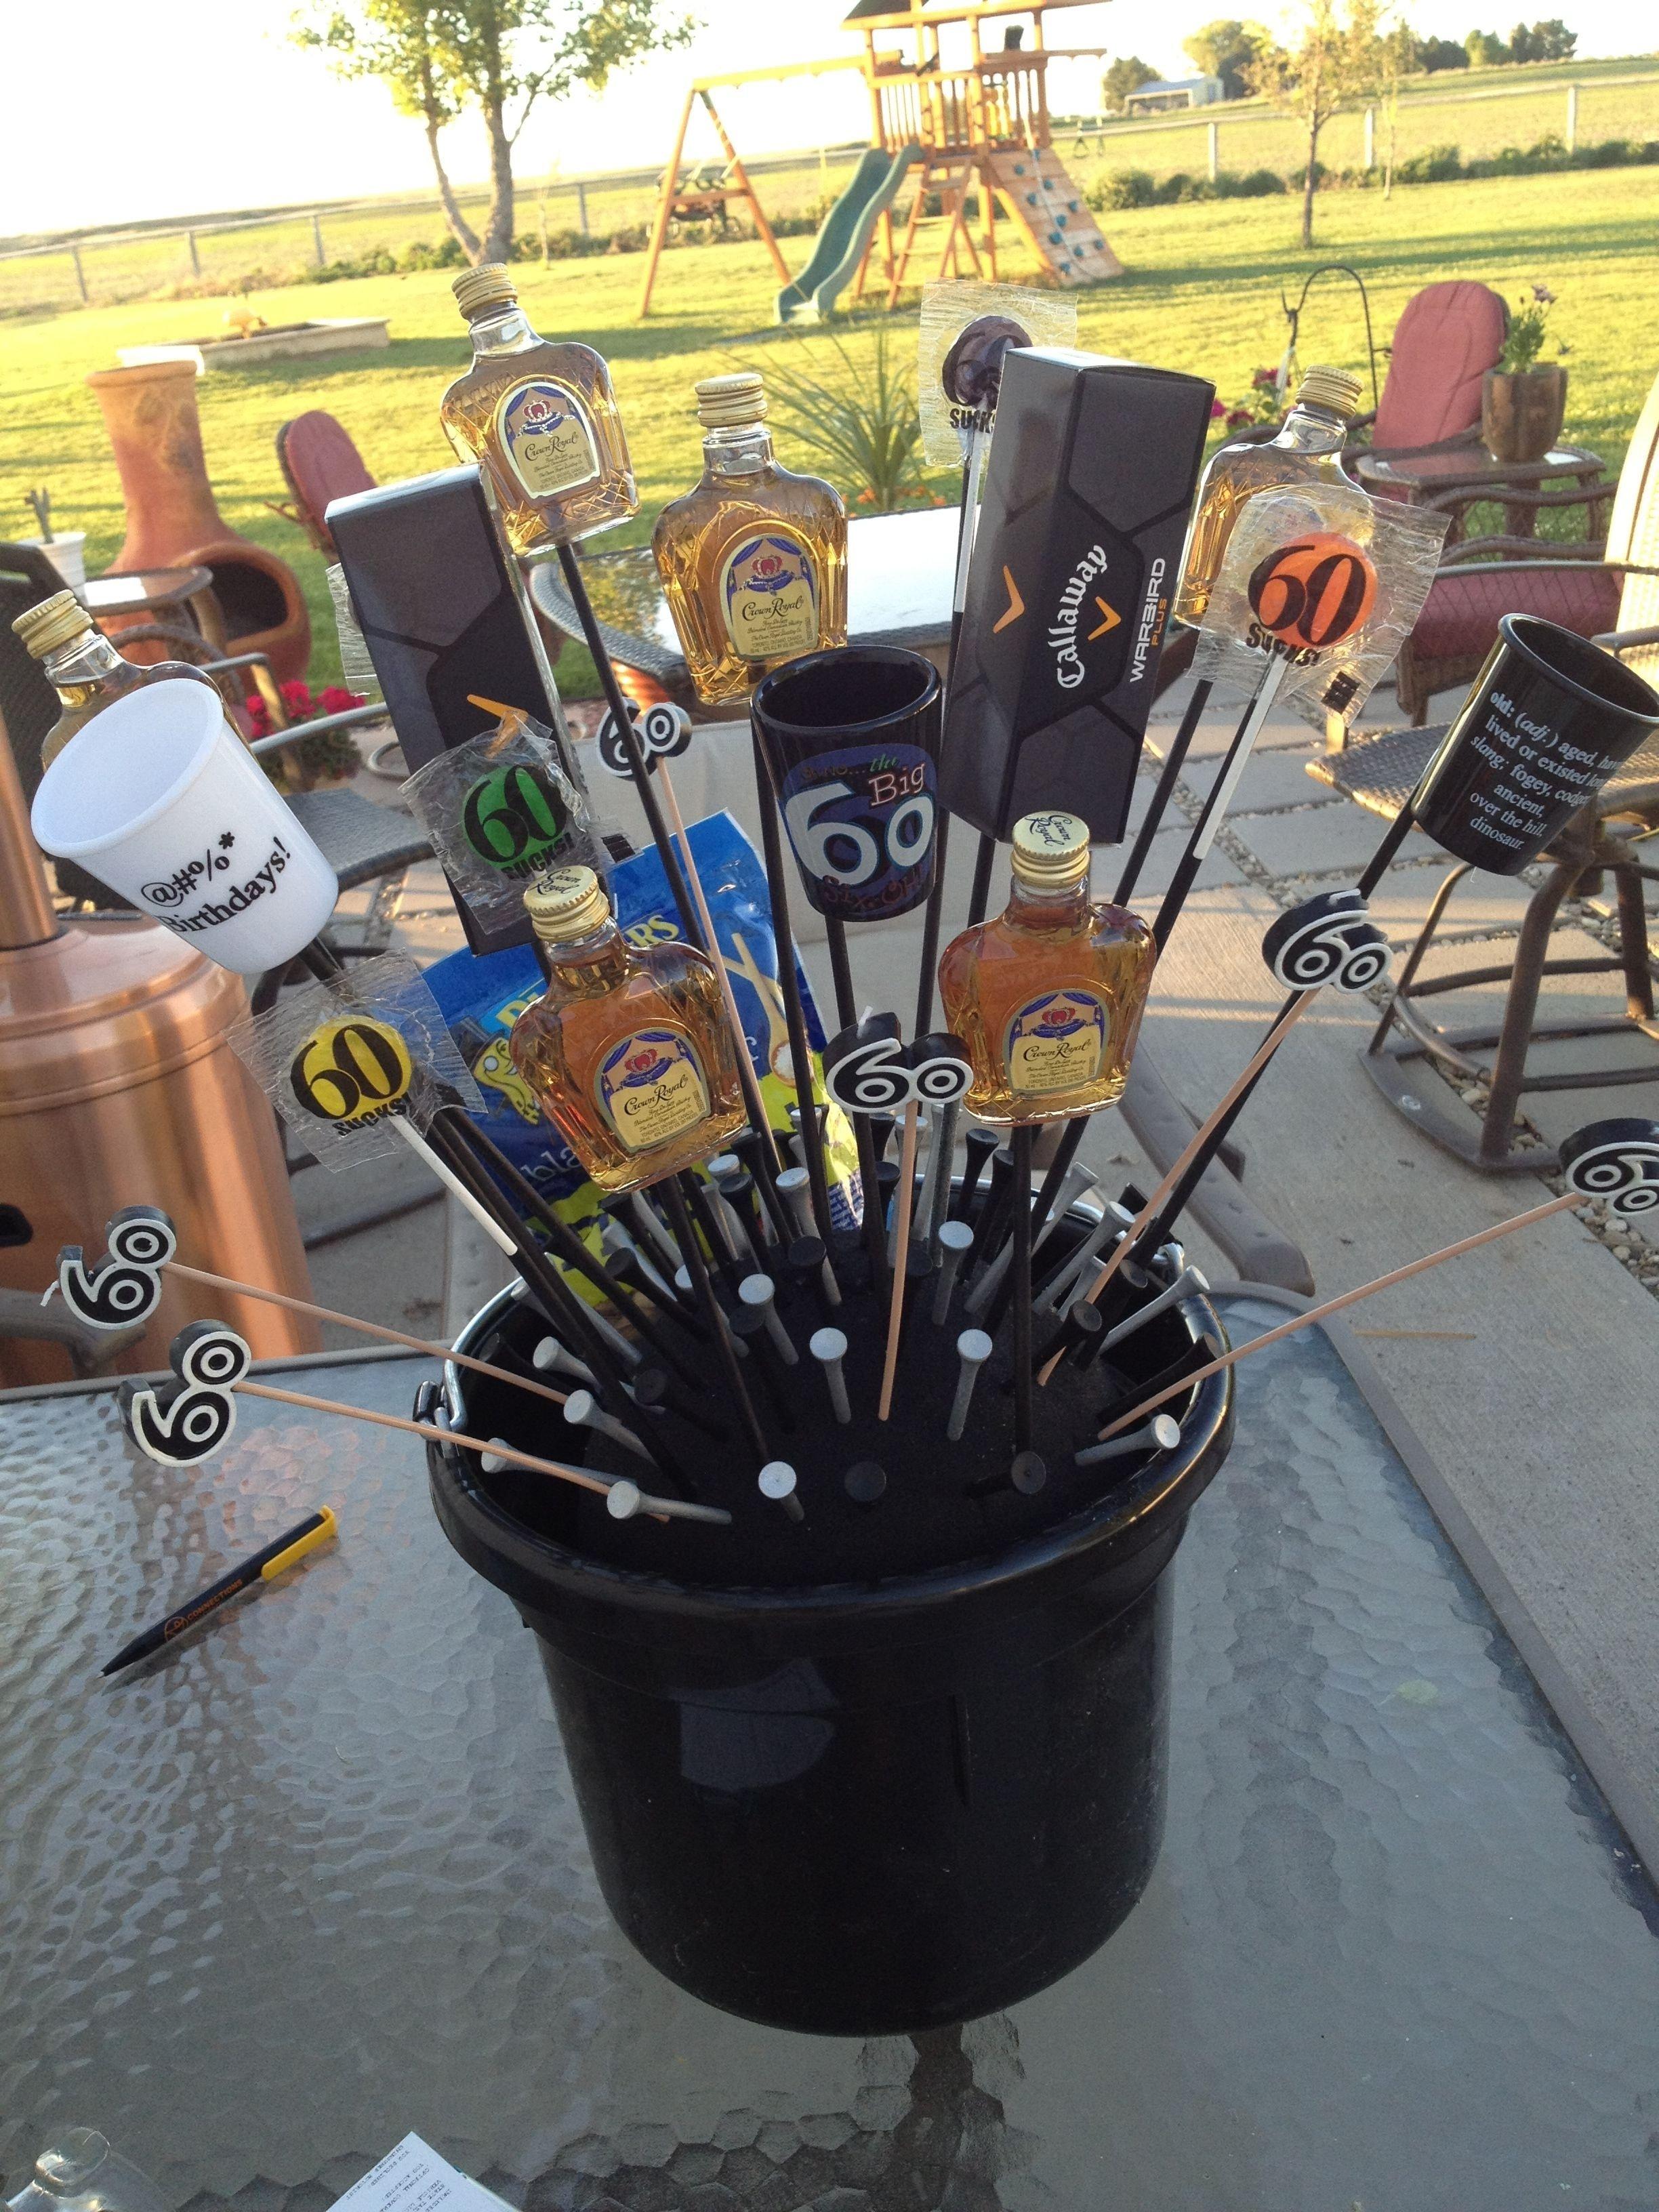 10 Best 60Th Birthday Ideas For Men birthday guy gift ideas diy crafts that i love pinterest 2 2020